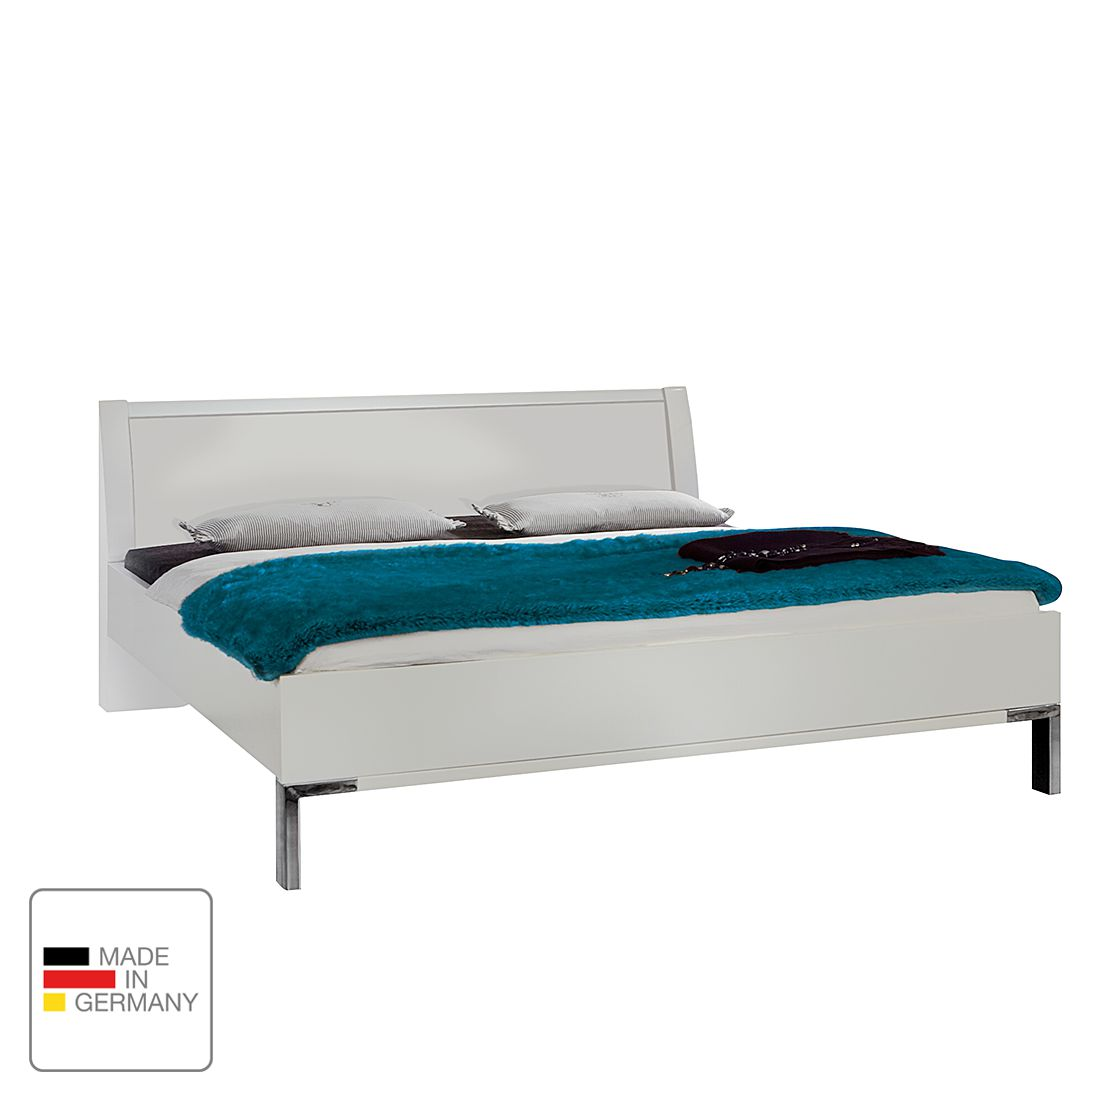 Lit futon Dubai I - Blanc alpin - 140 x 200cm - Sans éclairage, Wiemann